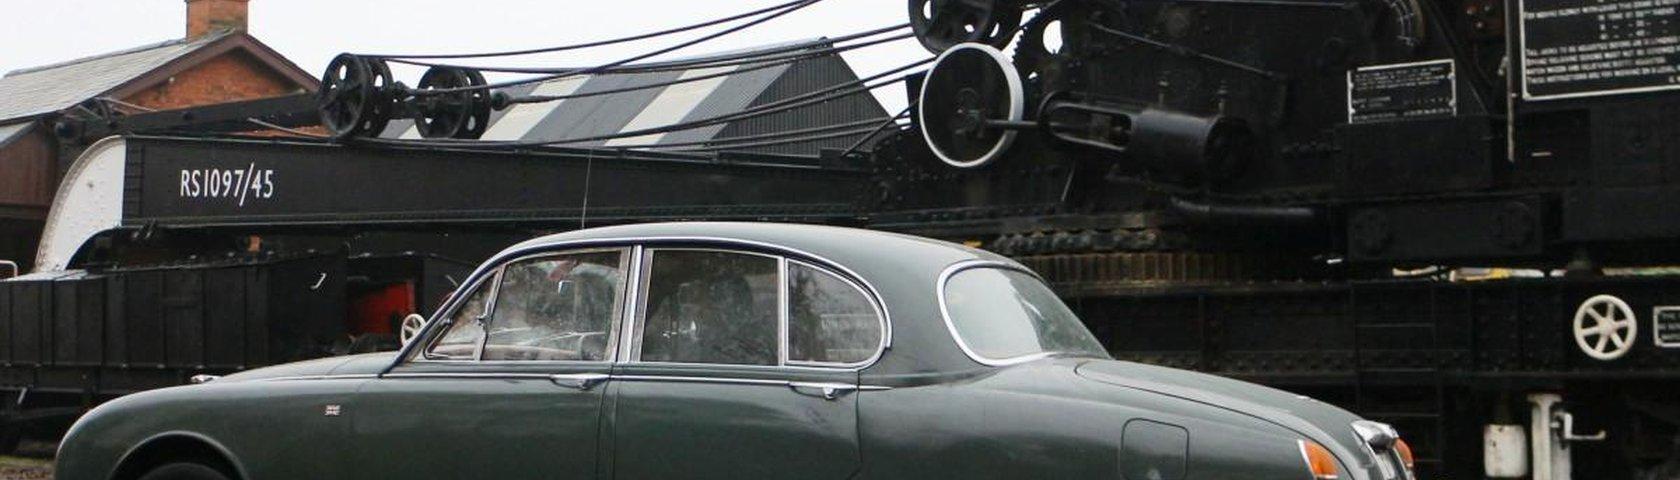 Jaguar Restoration From The Splined Hub Classis S Type 2